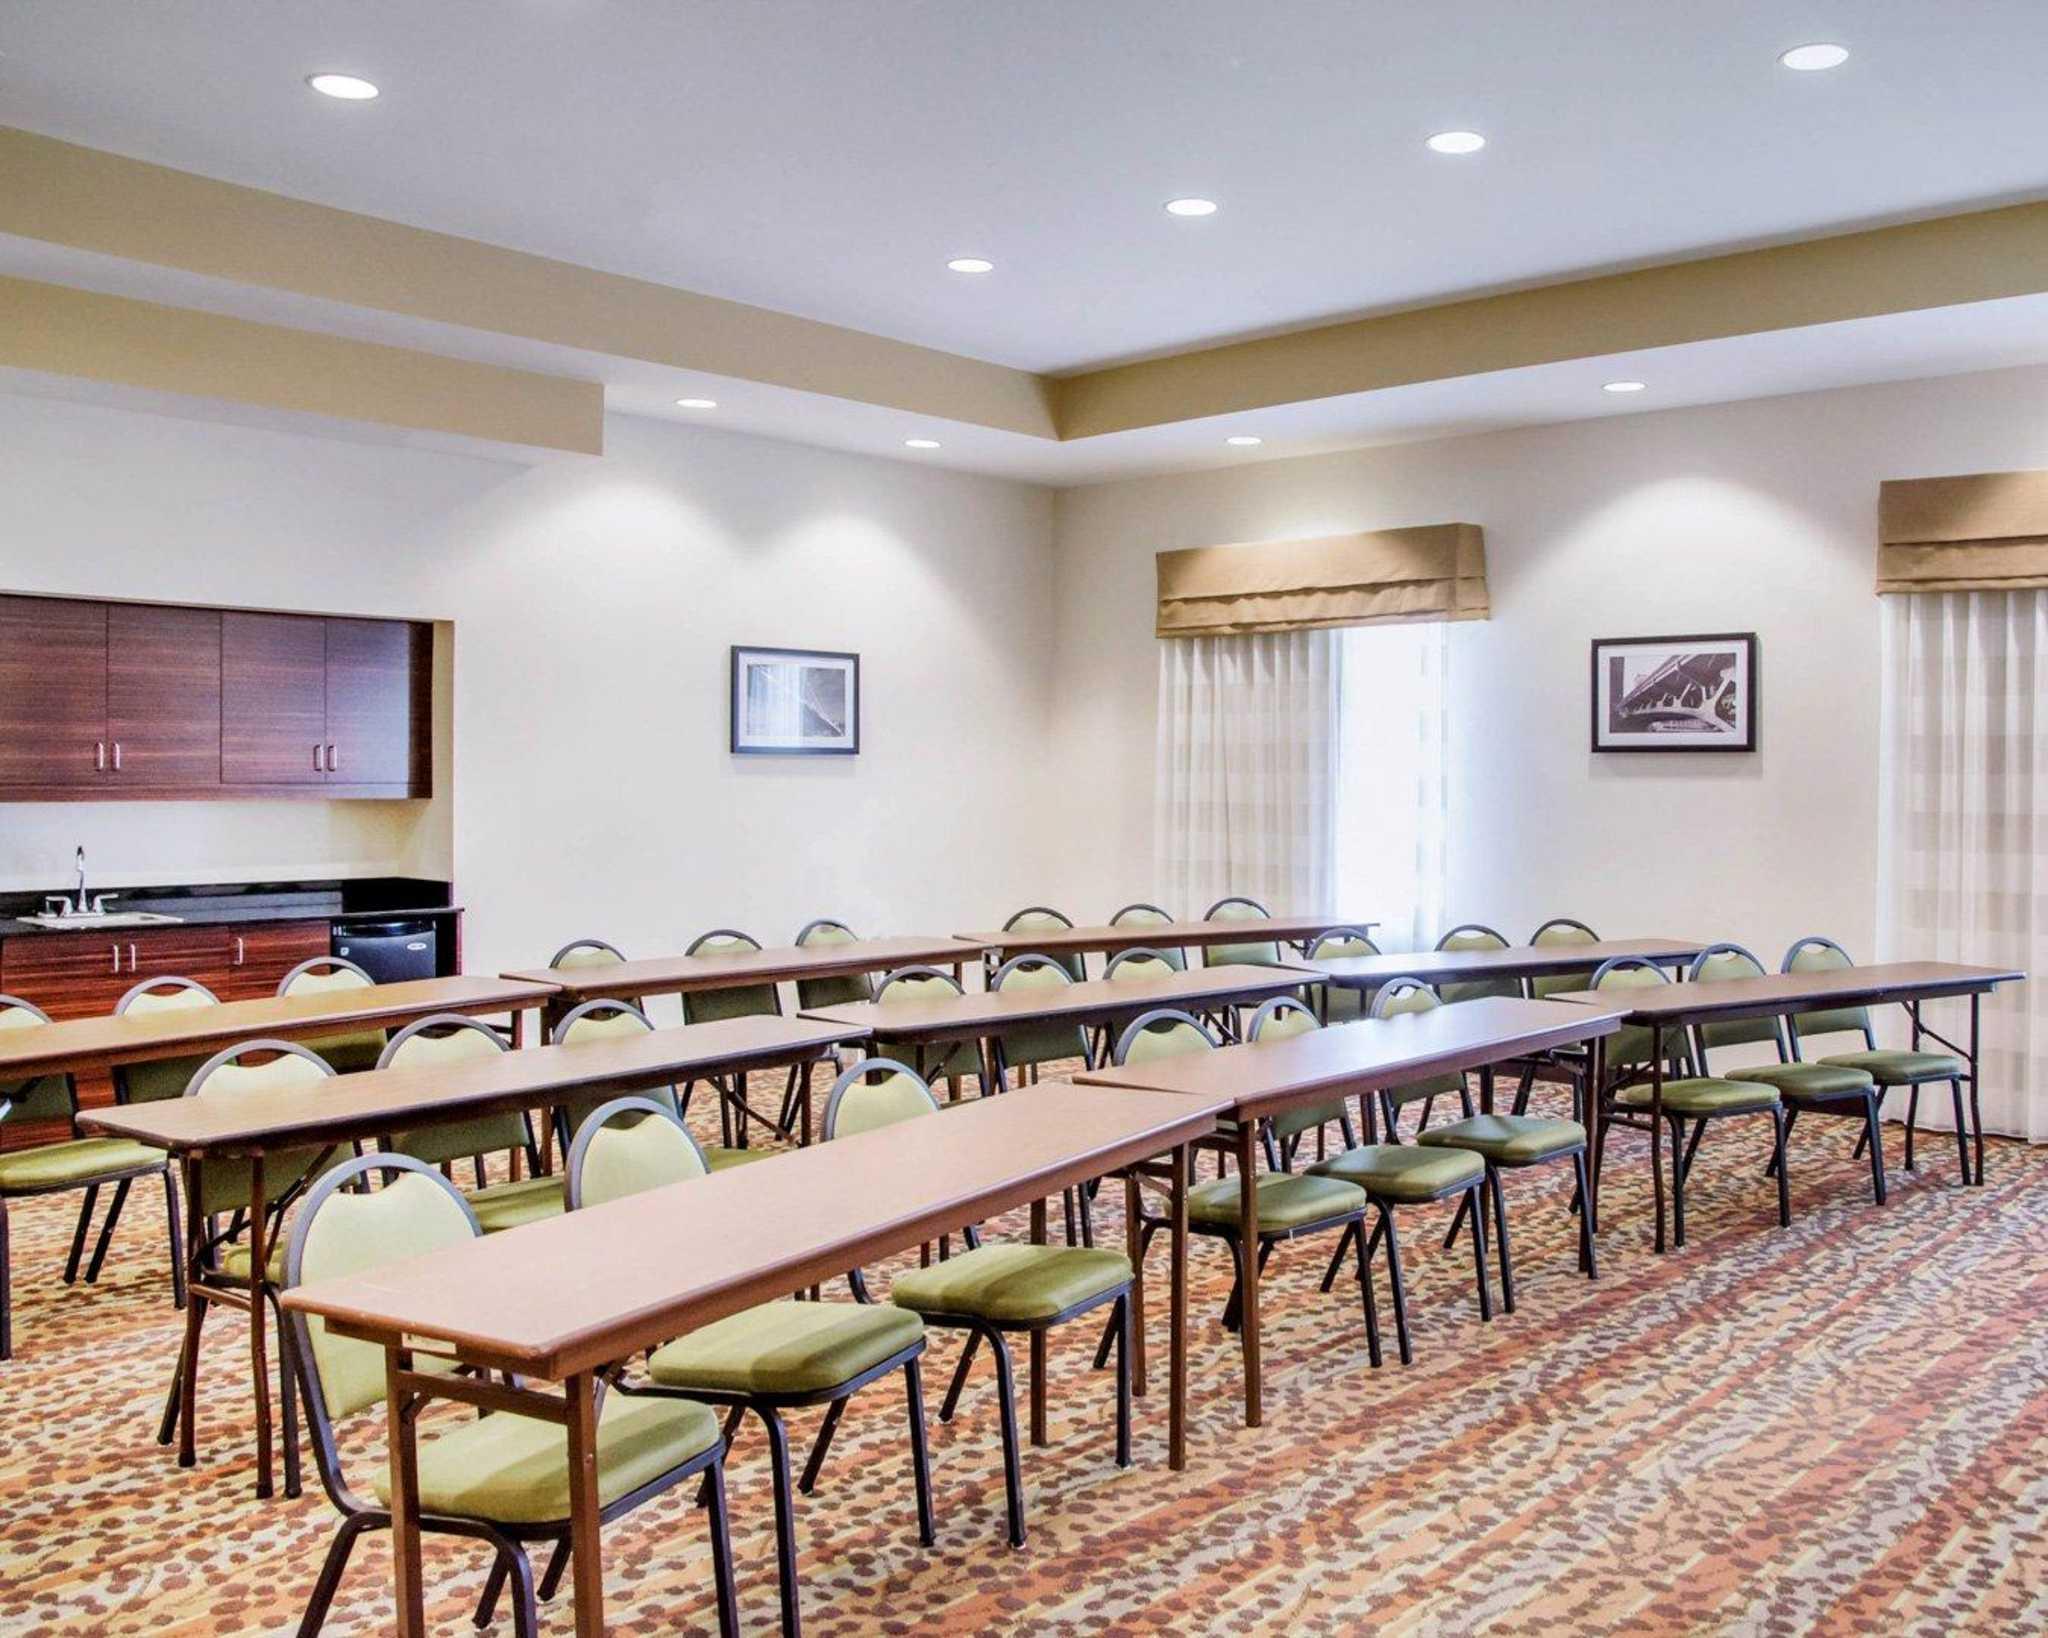 Sleep Inn & Suites Parkersburg-Marietta image 19